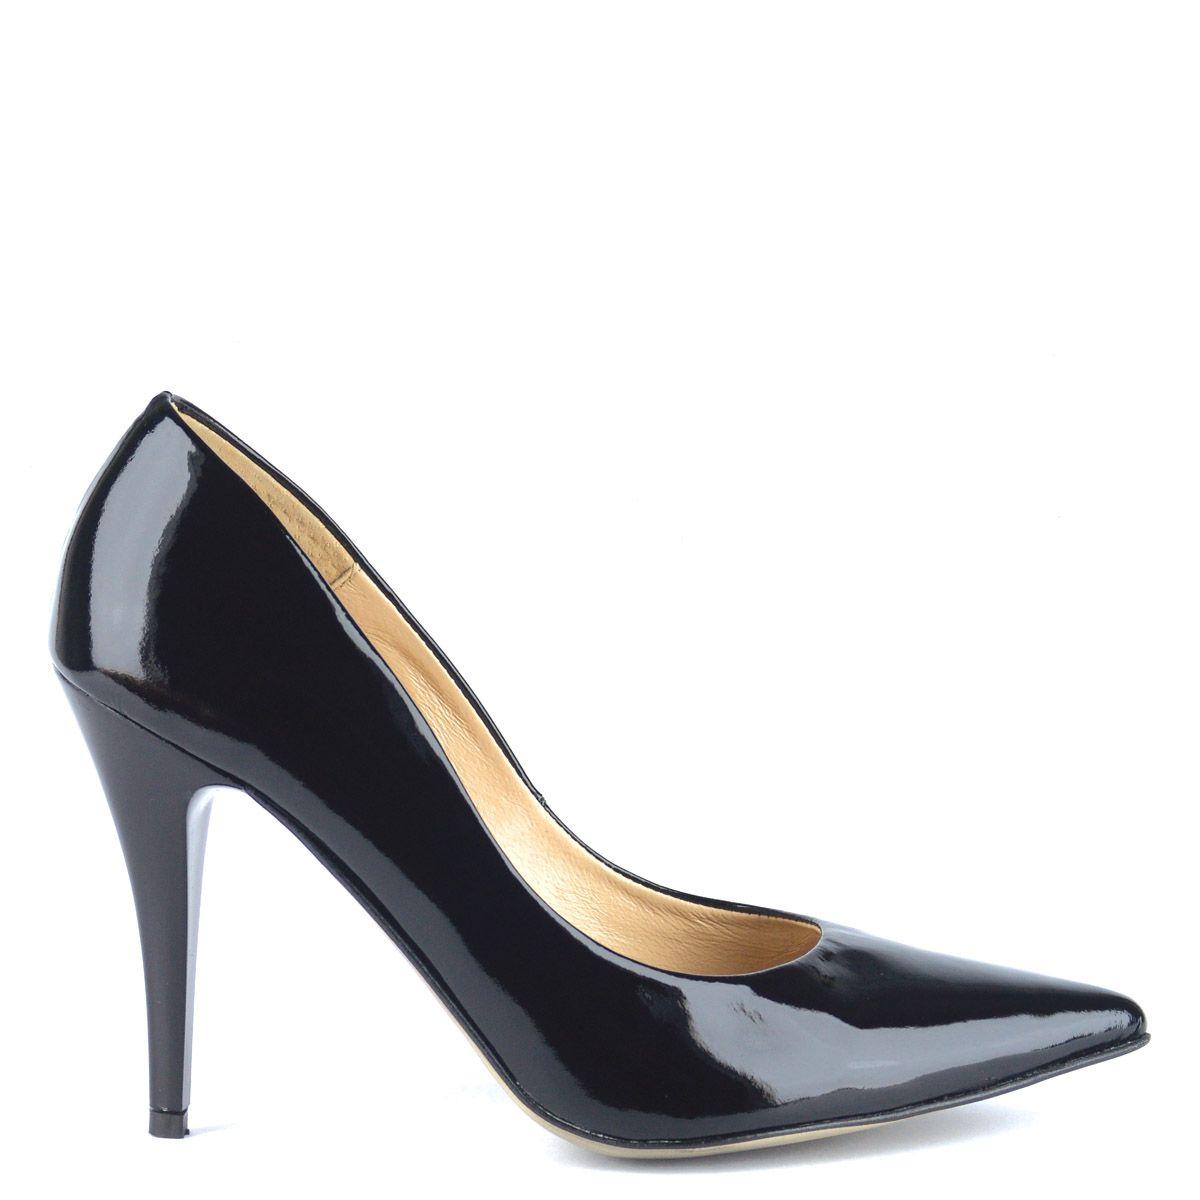 Prestige alkalmi cipő   ChiX.hu cipő webáruház - ChiX.hu Online Shoes - http://chix.hu